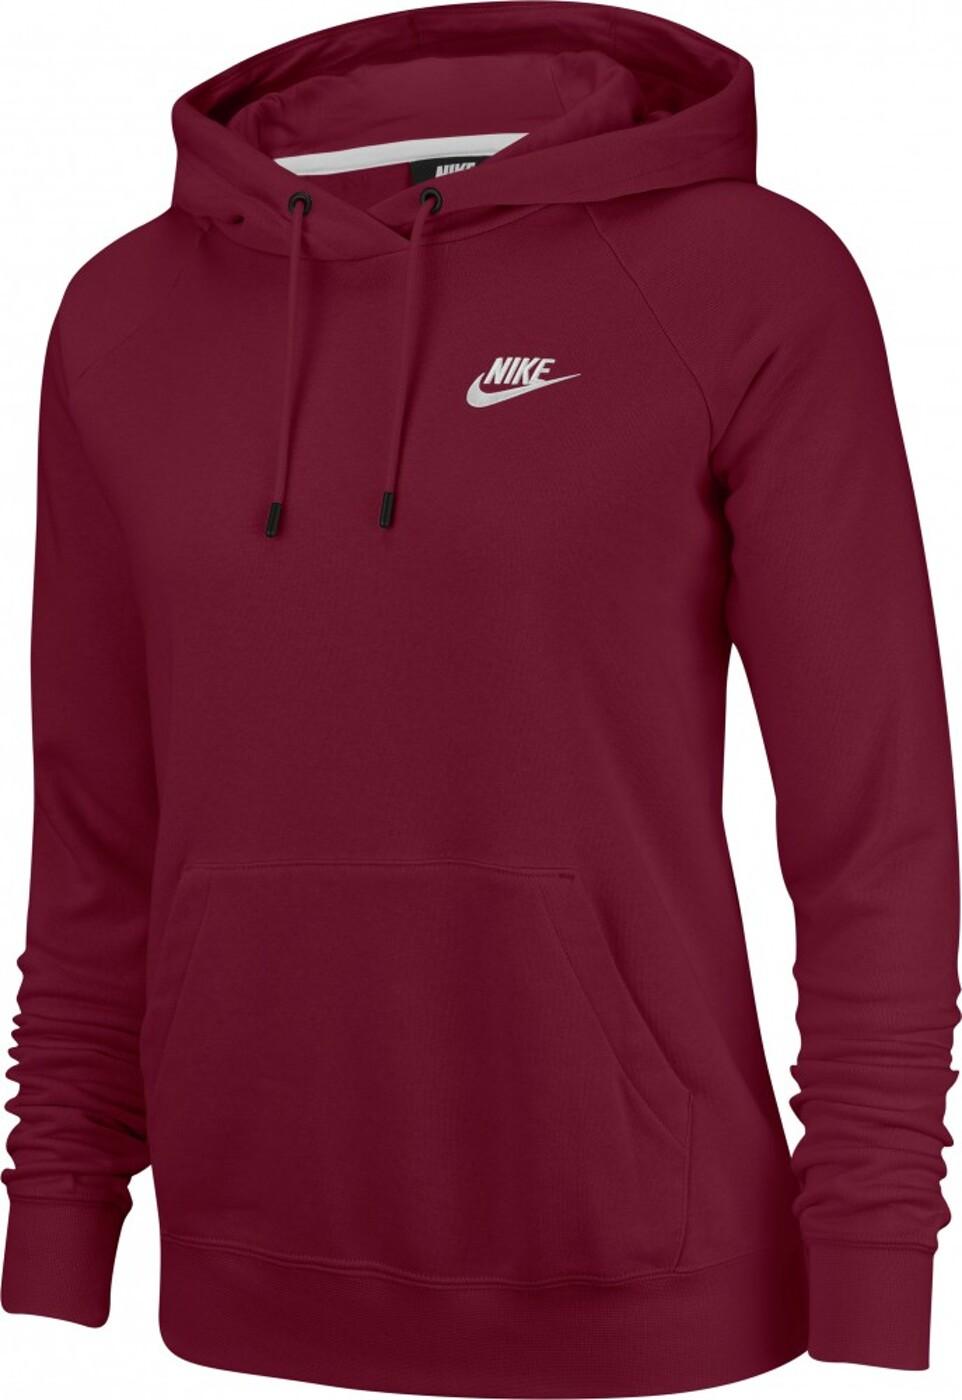 Pullover Nike Sportswear Essential Wome - Damen